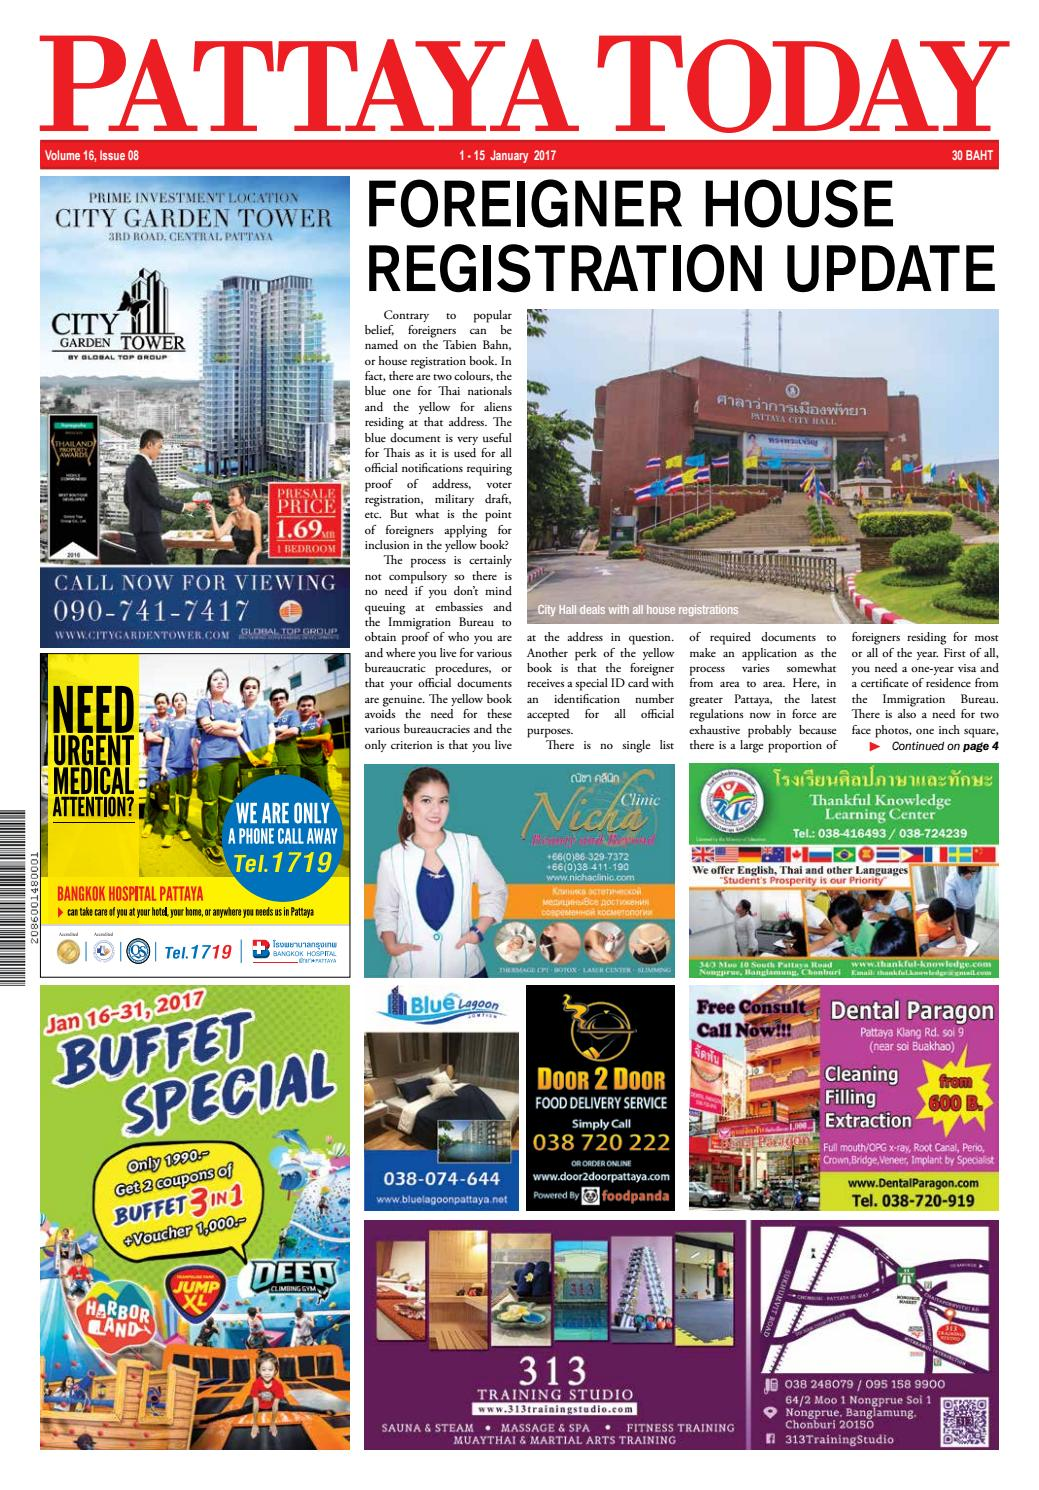 Pattaya Today Vol 16 Issue 08 - 1-15 January 2017 by Pattaya